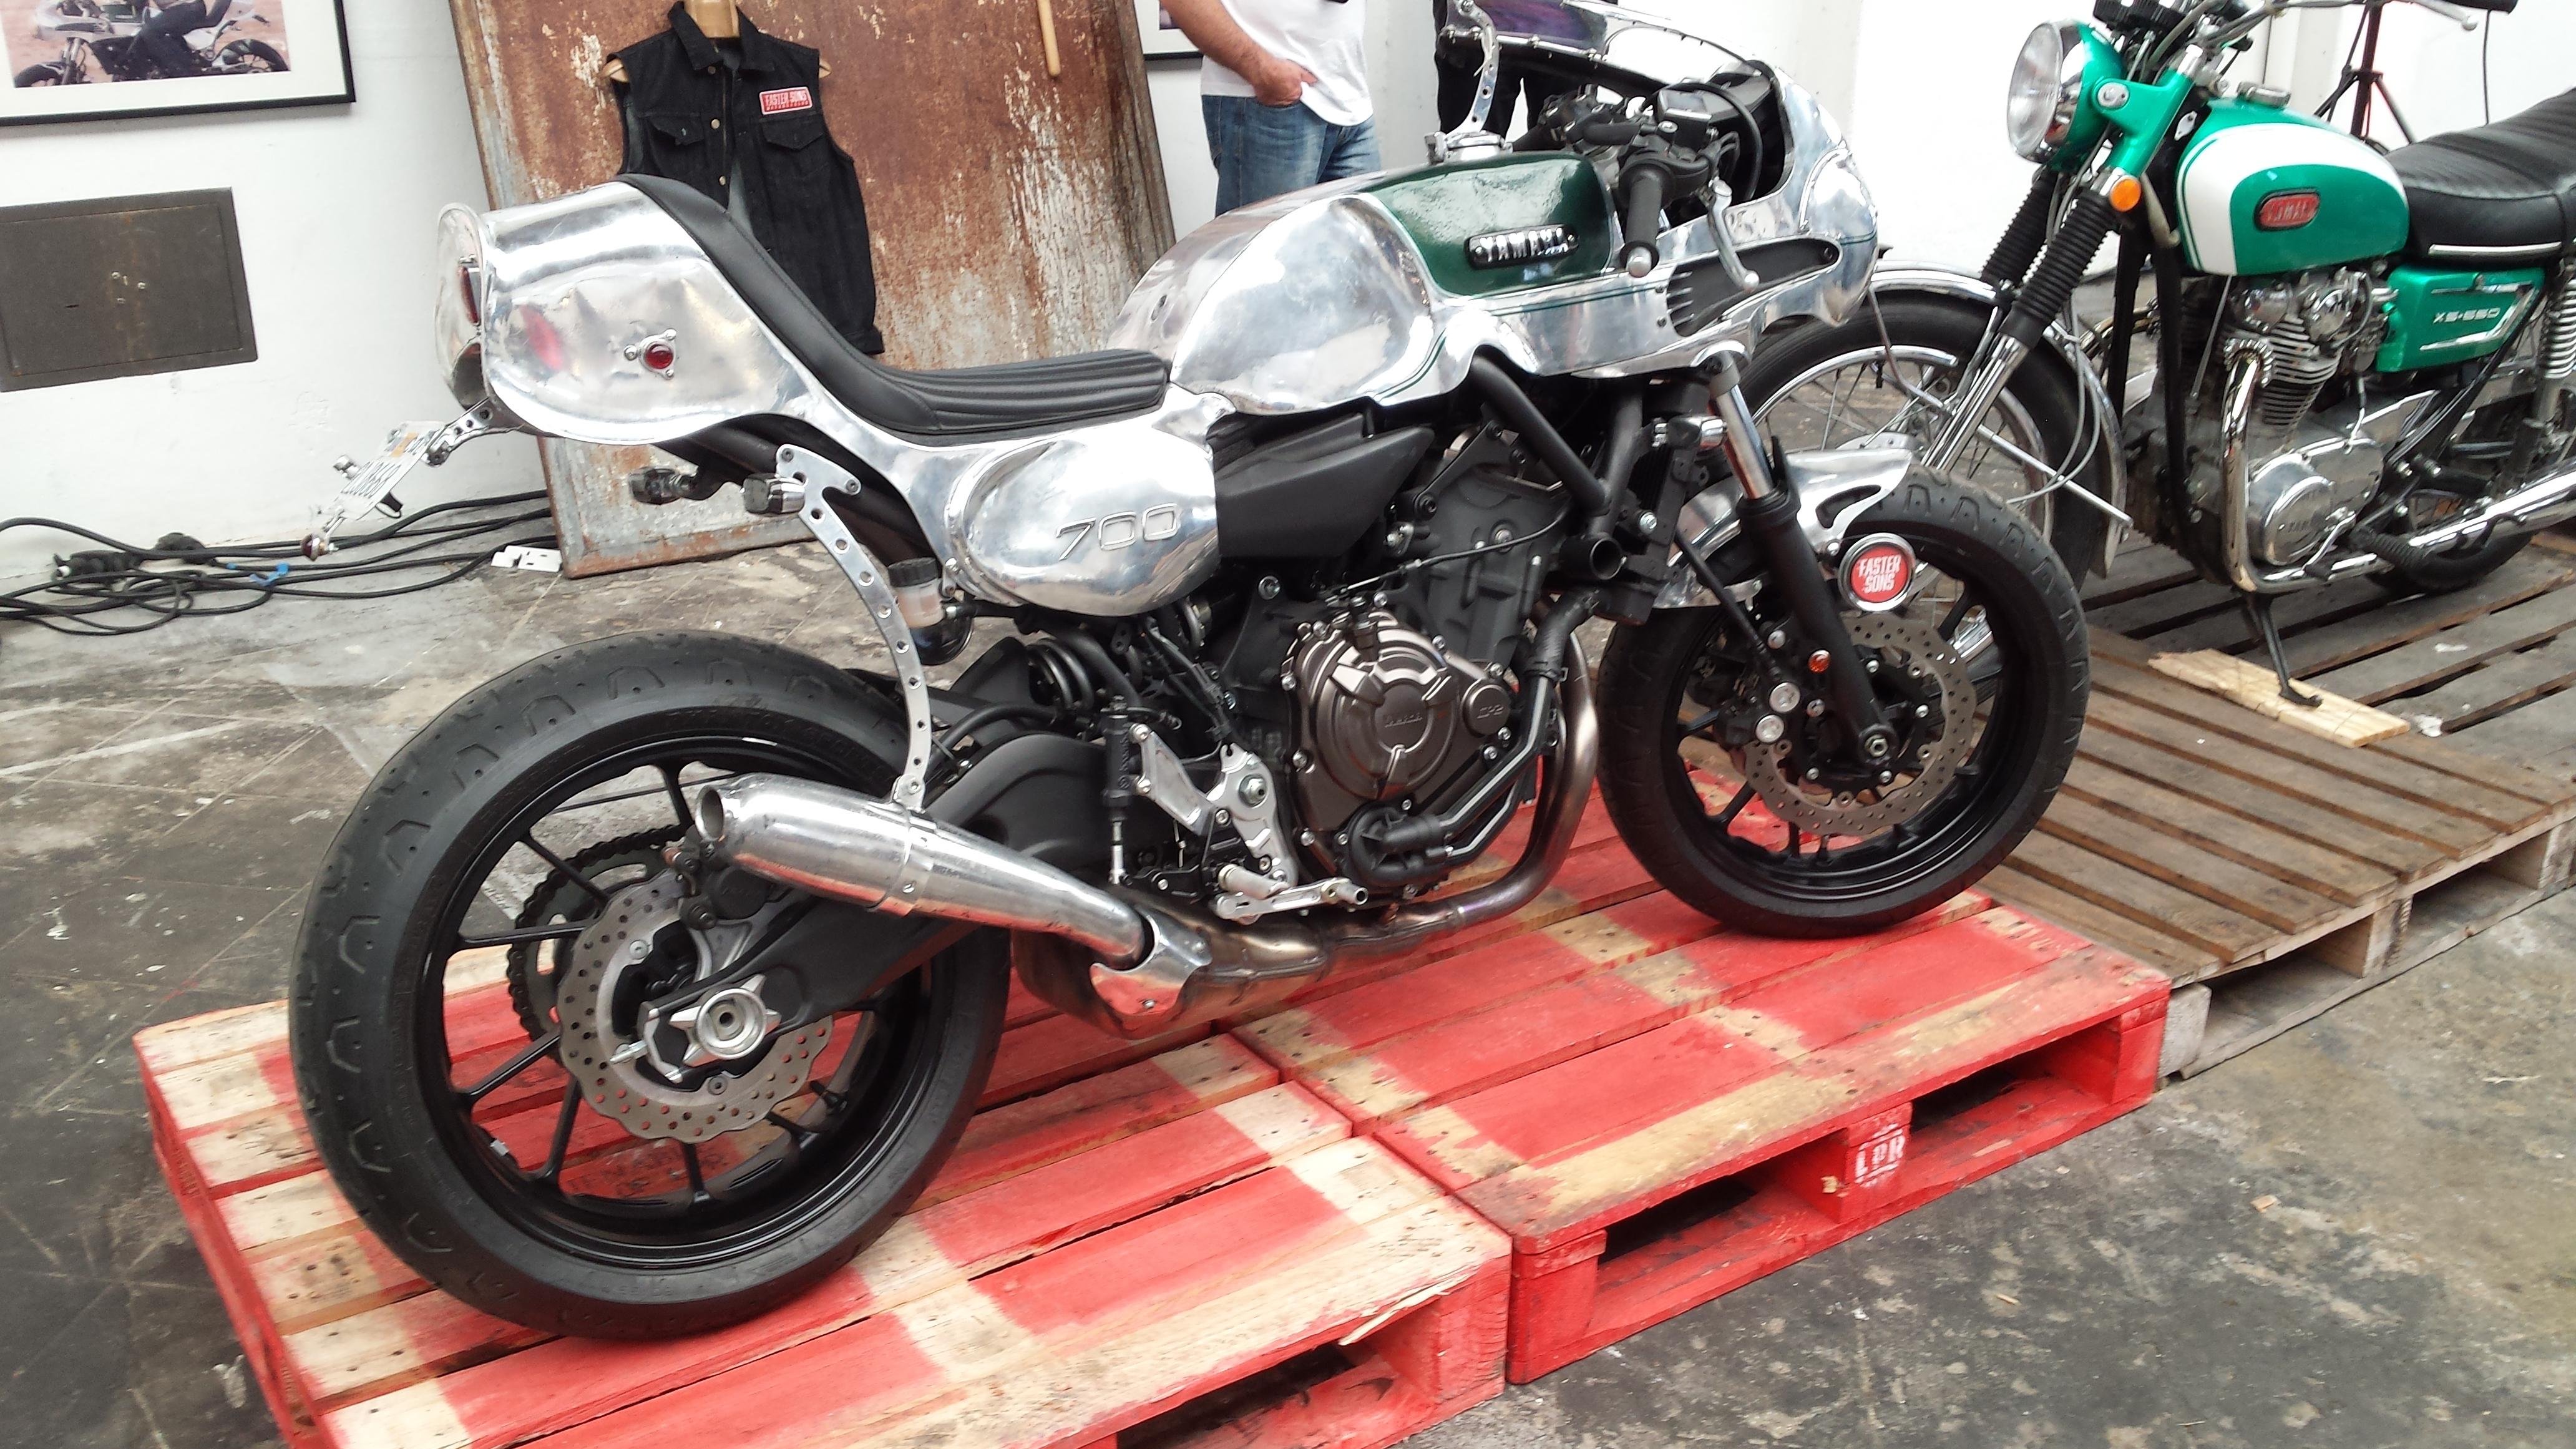 Yamaha's retro MT-07 debuts